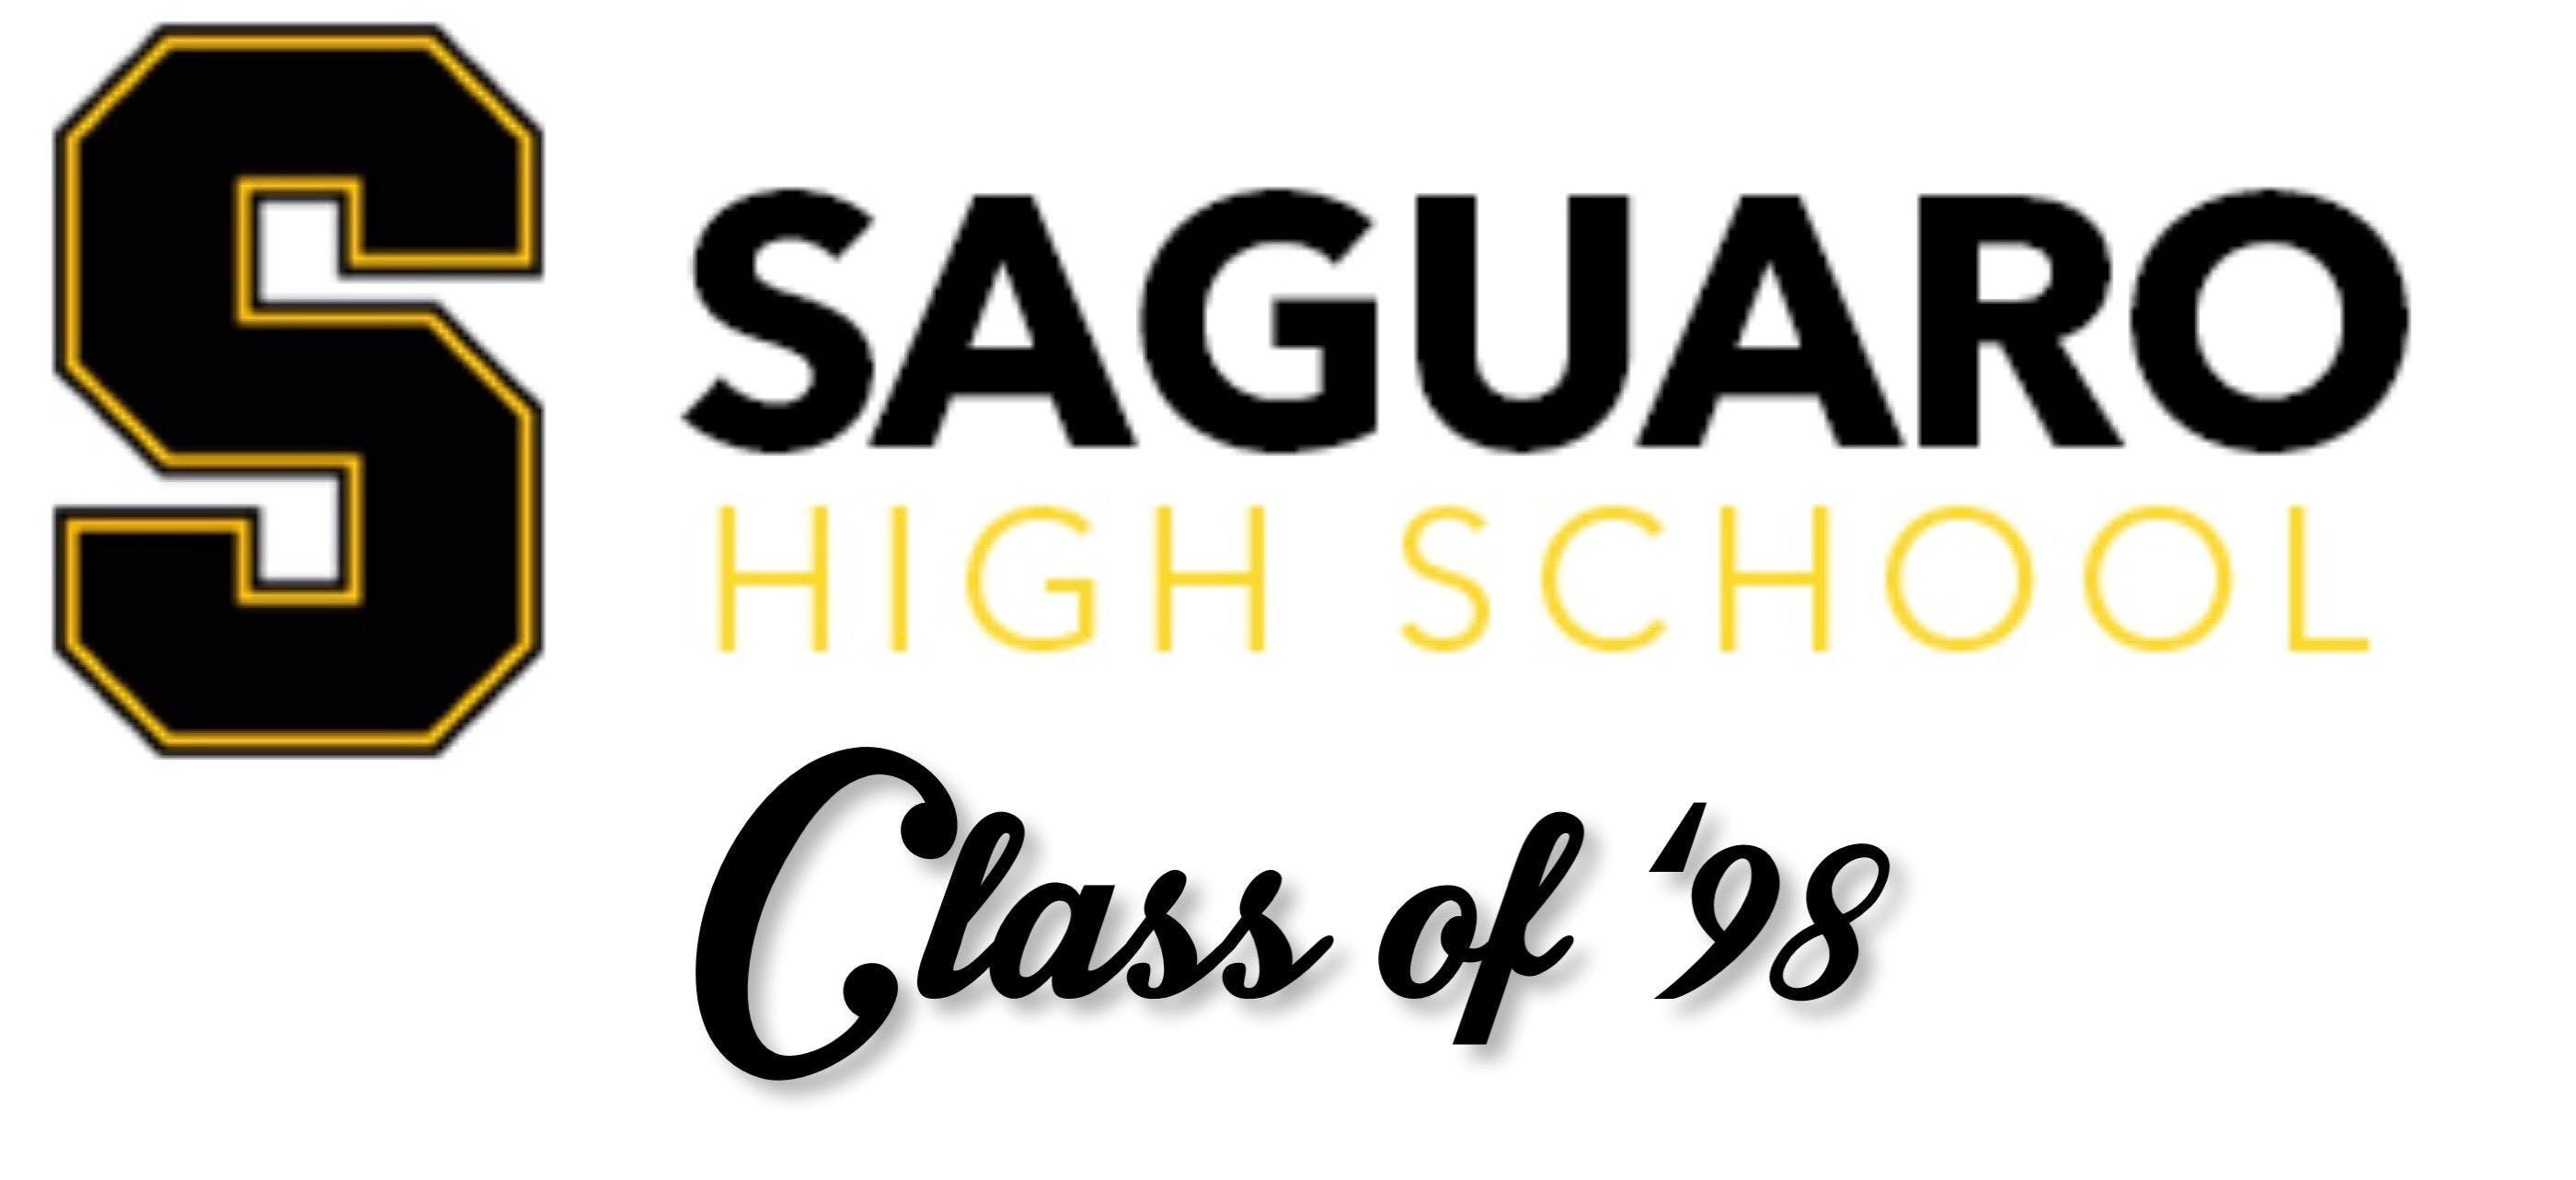 Saguaro High School Reunion - Class of '98